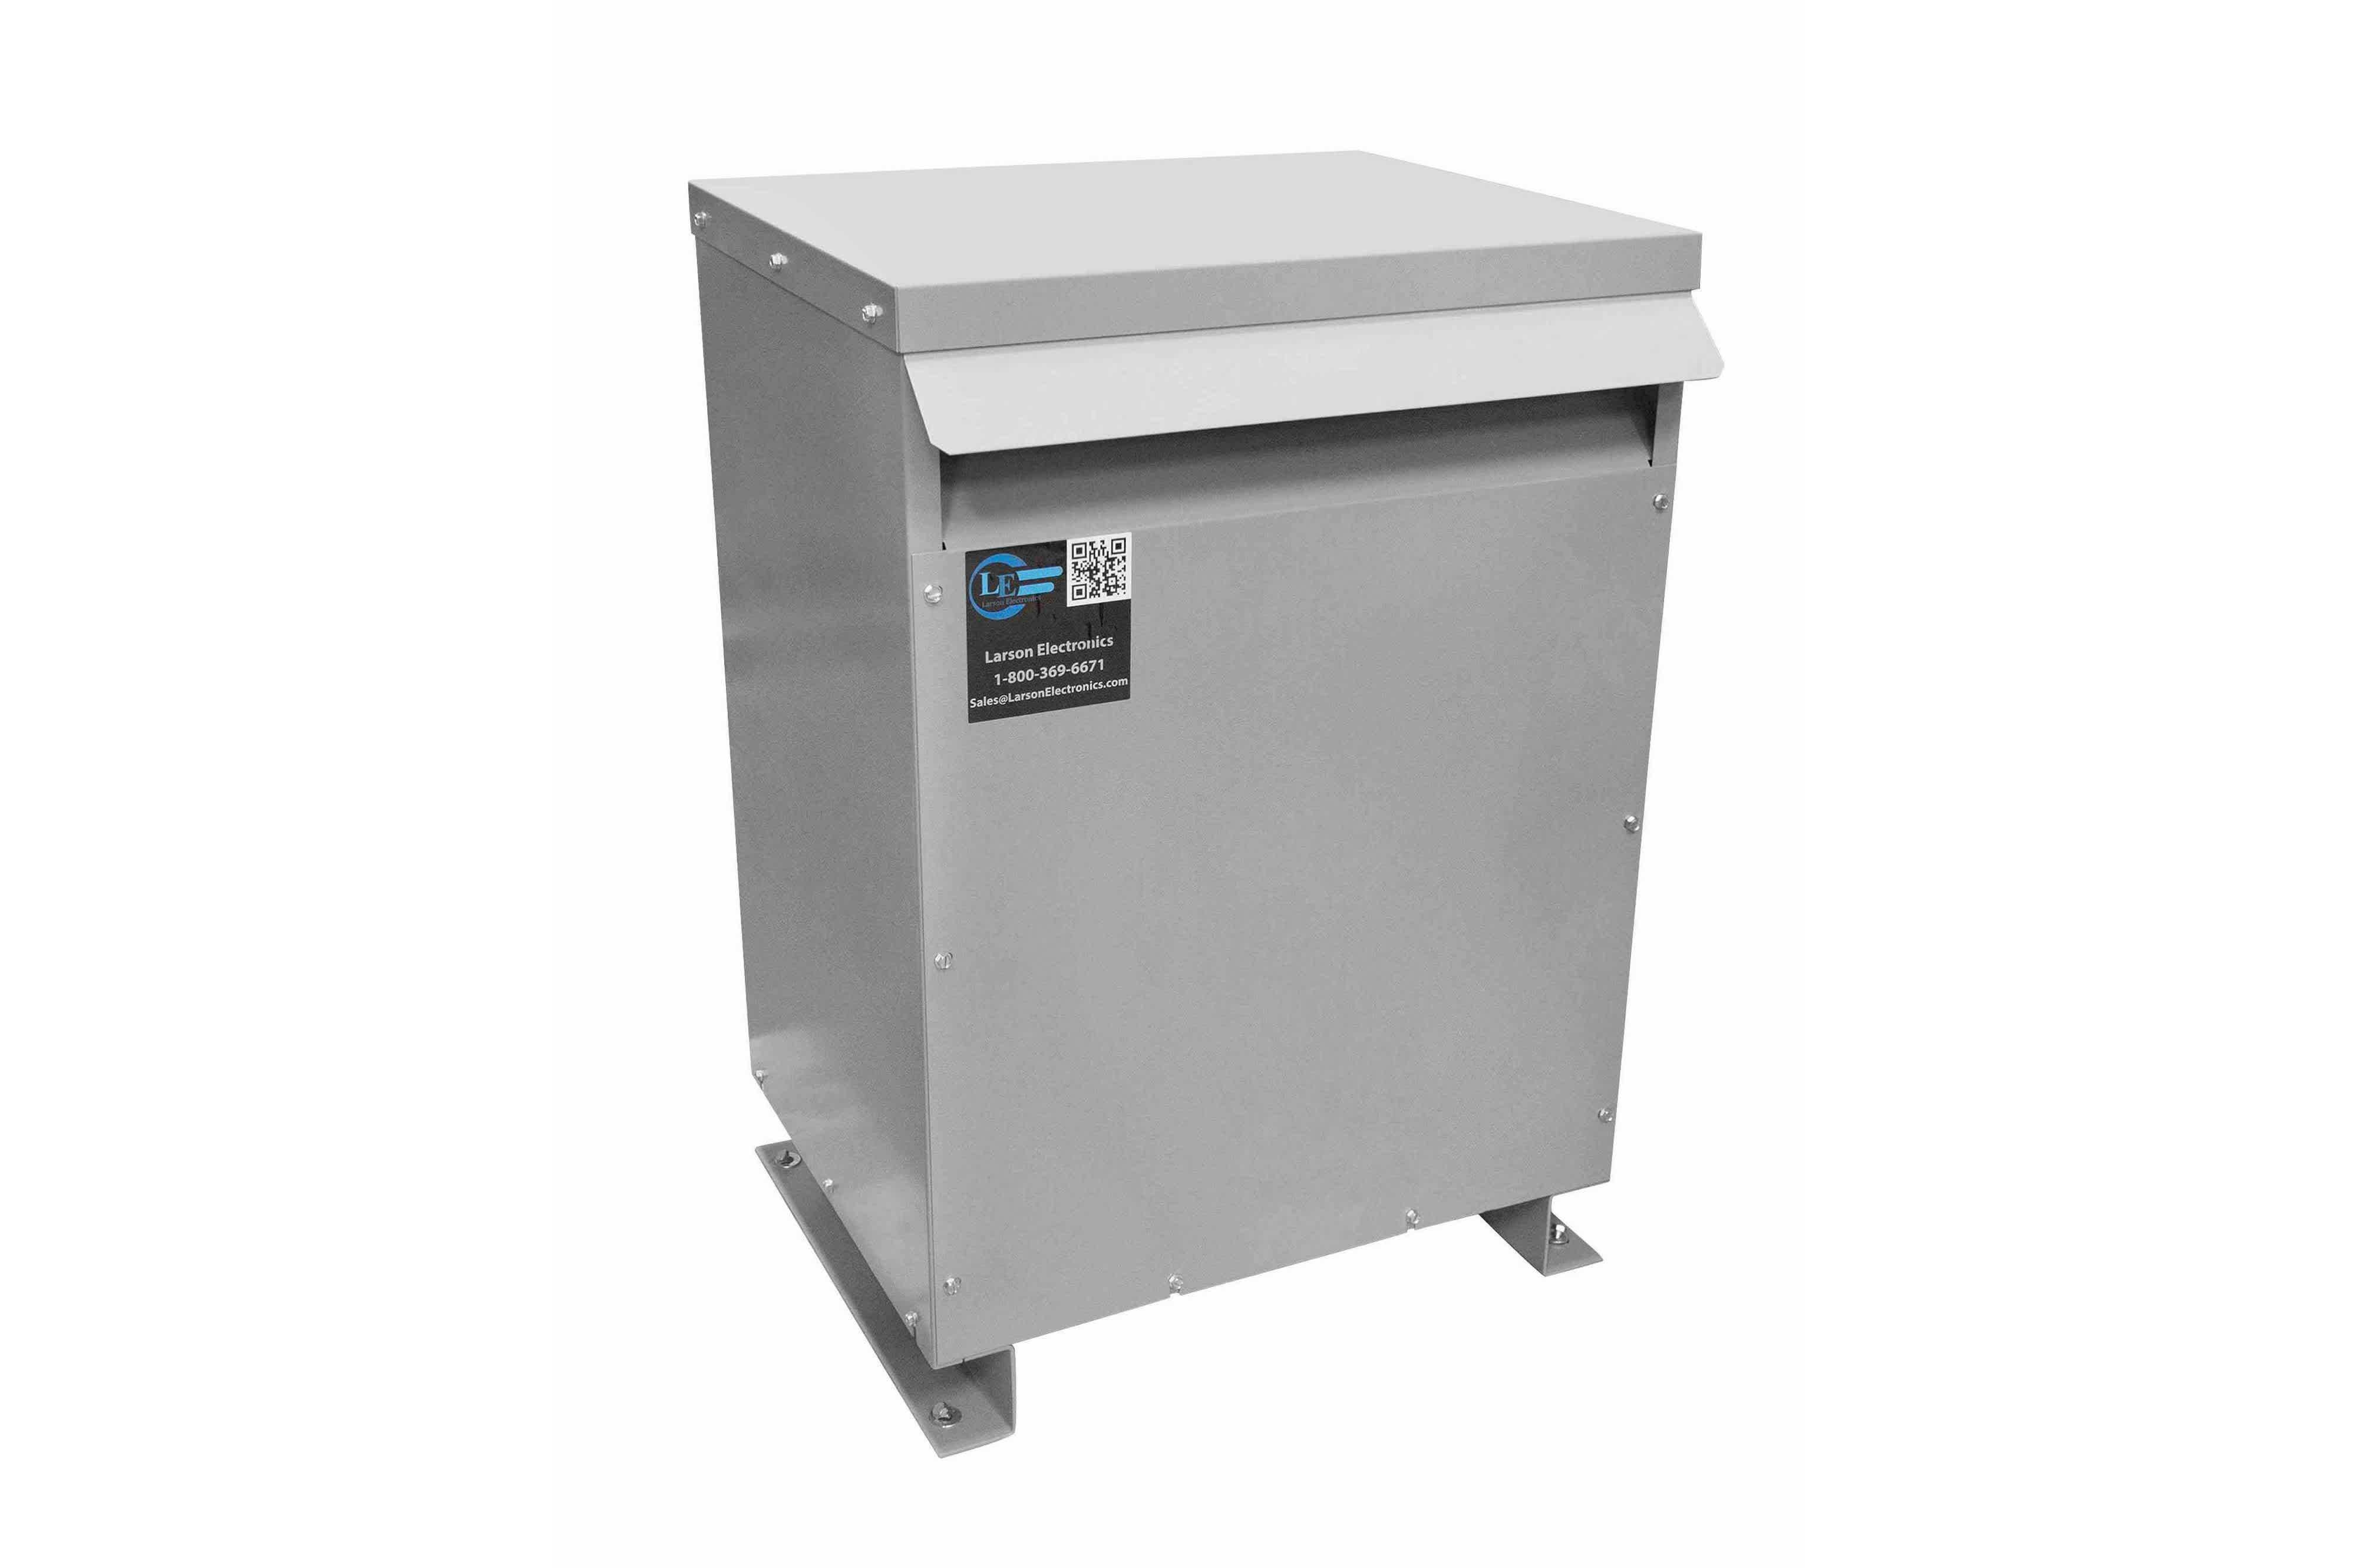 10 kVA 3PH Isolation Transformer, 600V Wye Primary, 415Y/240 Wye-N Secondary, N3R, Ventilated, 60 Hz